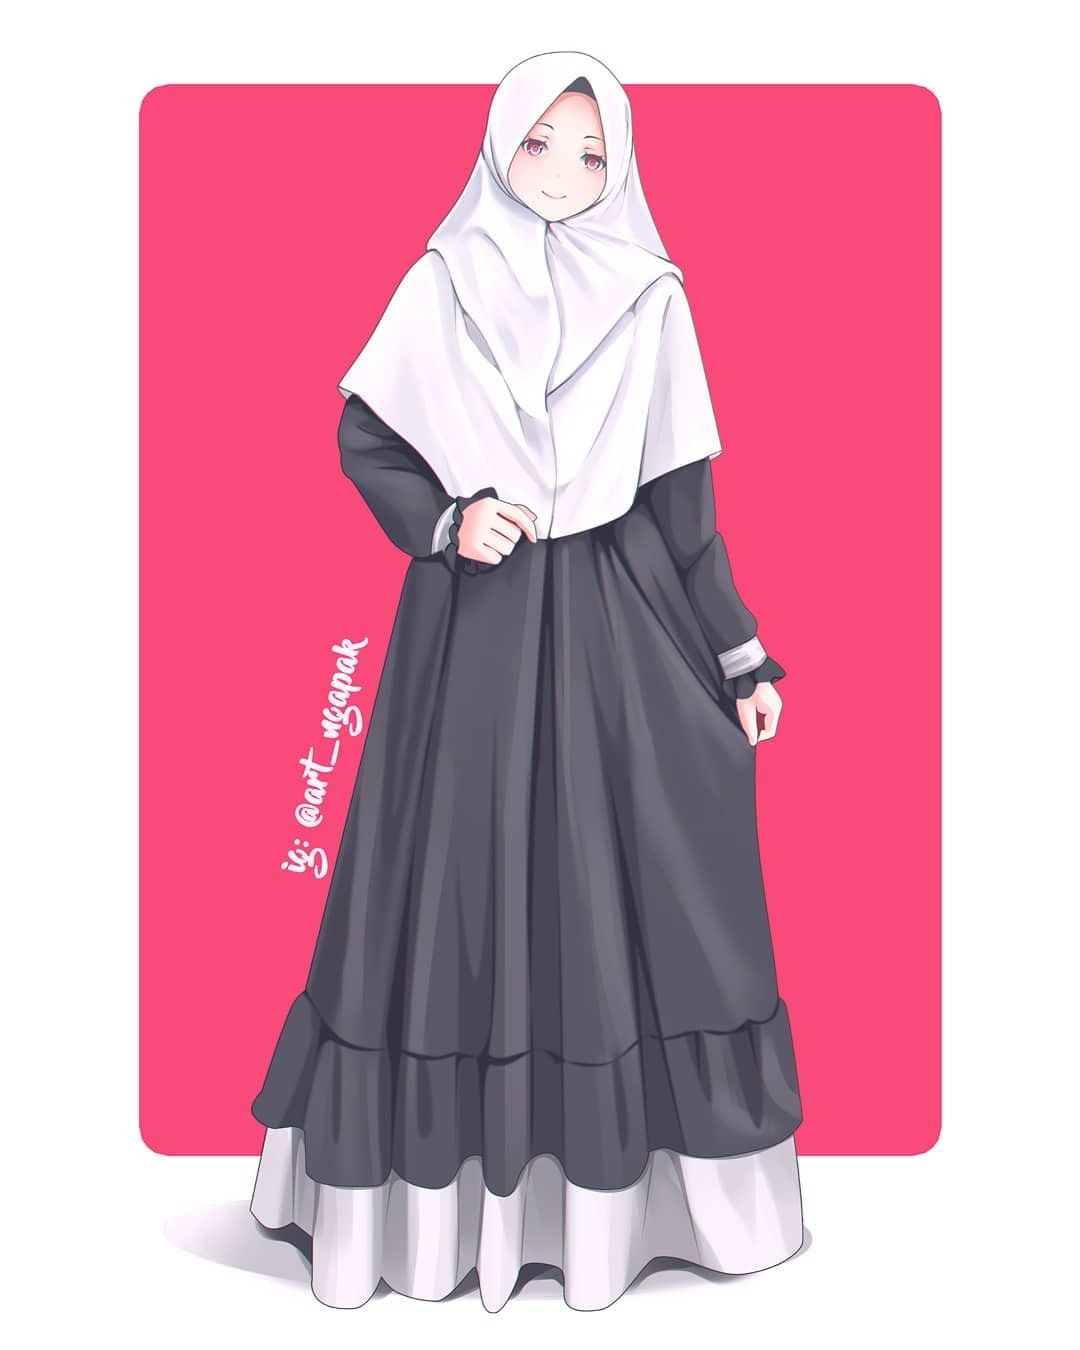 Pin Oleh Takia Di Anime Muslimah Elit Gadis Anime Model Pakaian Hijab Wanita